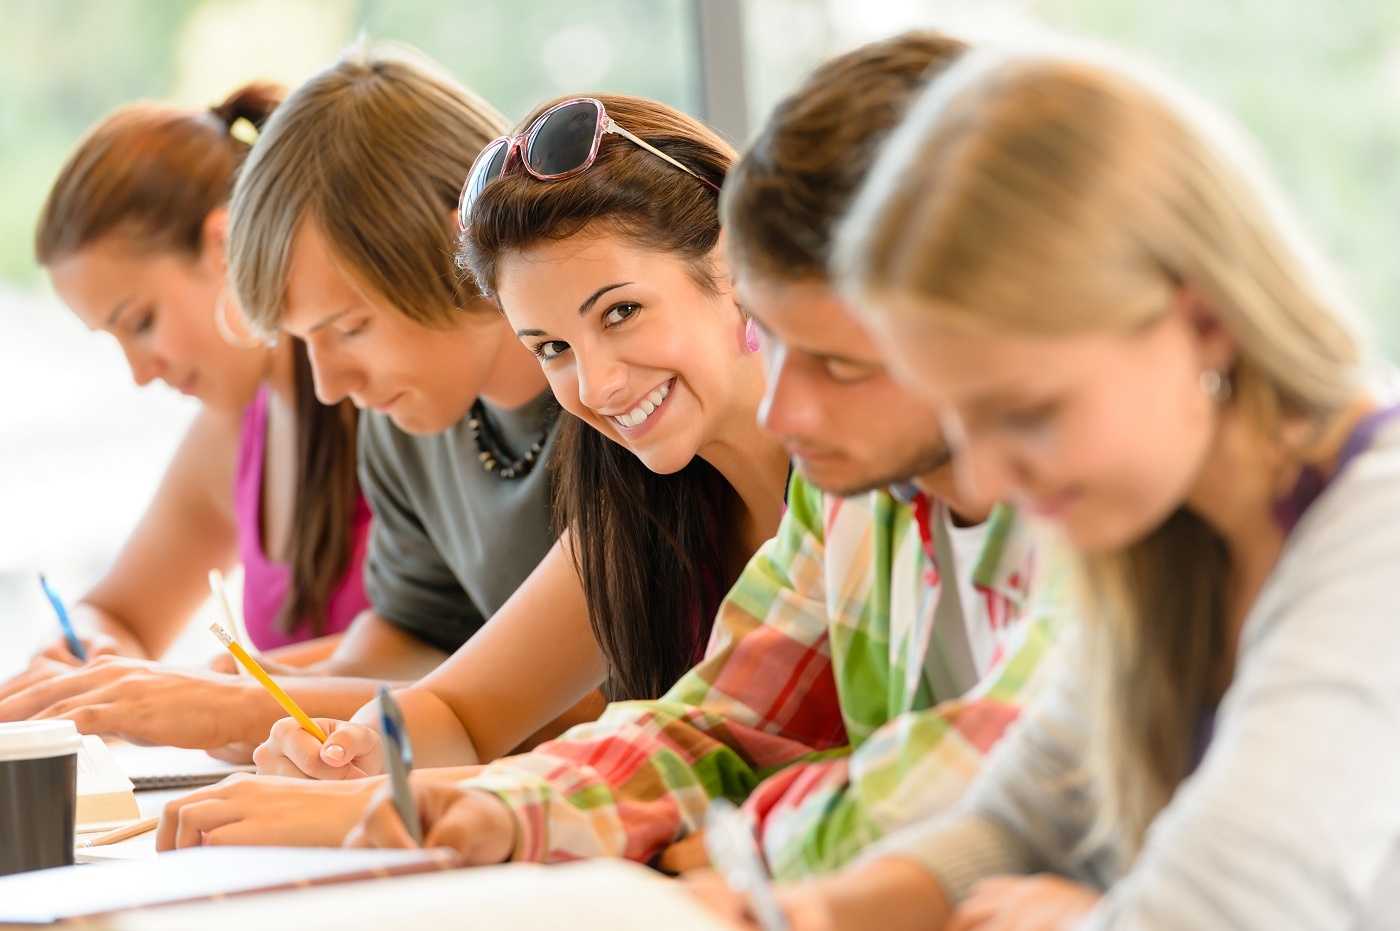 7 Ways You Can Make Academic Writing Interesting